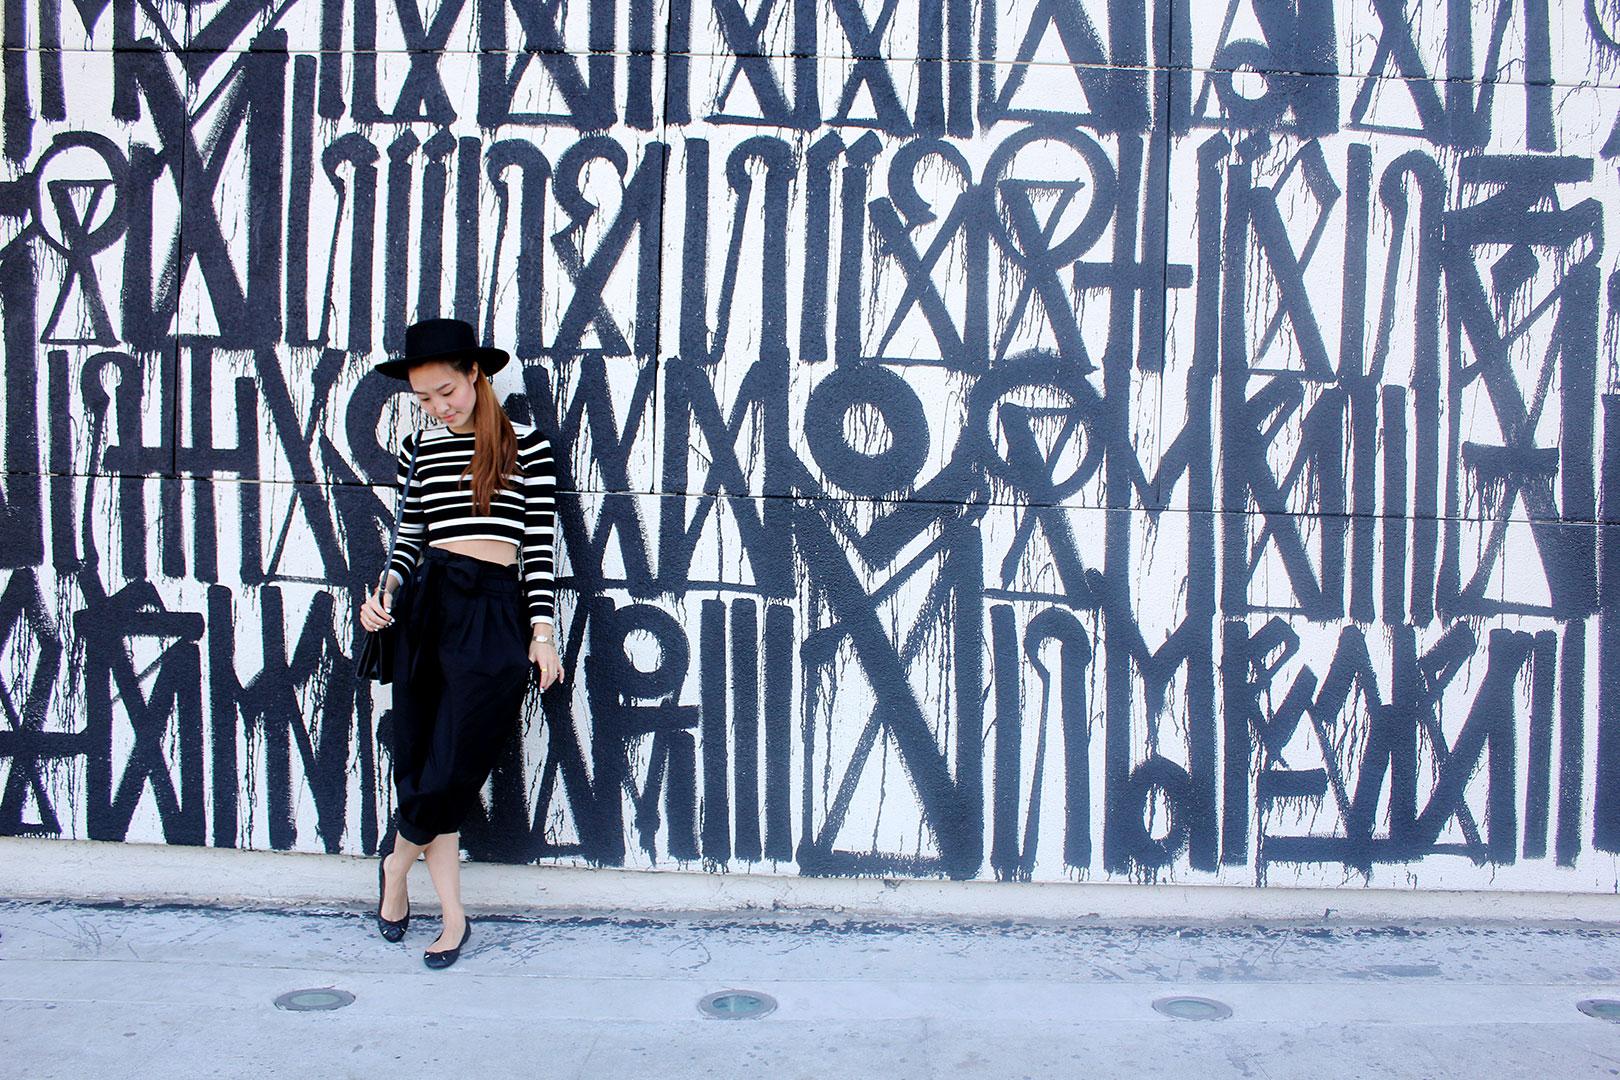 Retna graffiti, Hat by Stylenanda, Kinsley crop top, Zara flats